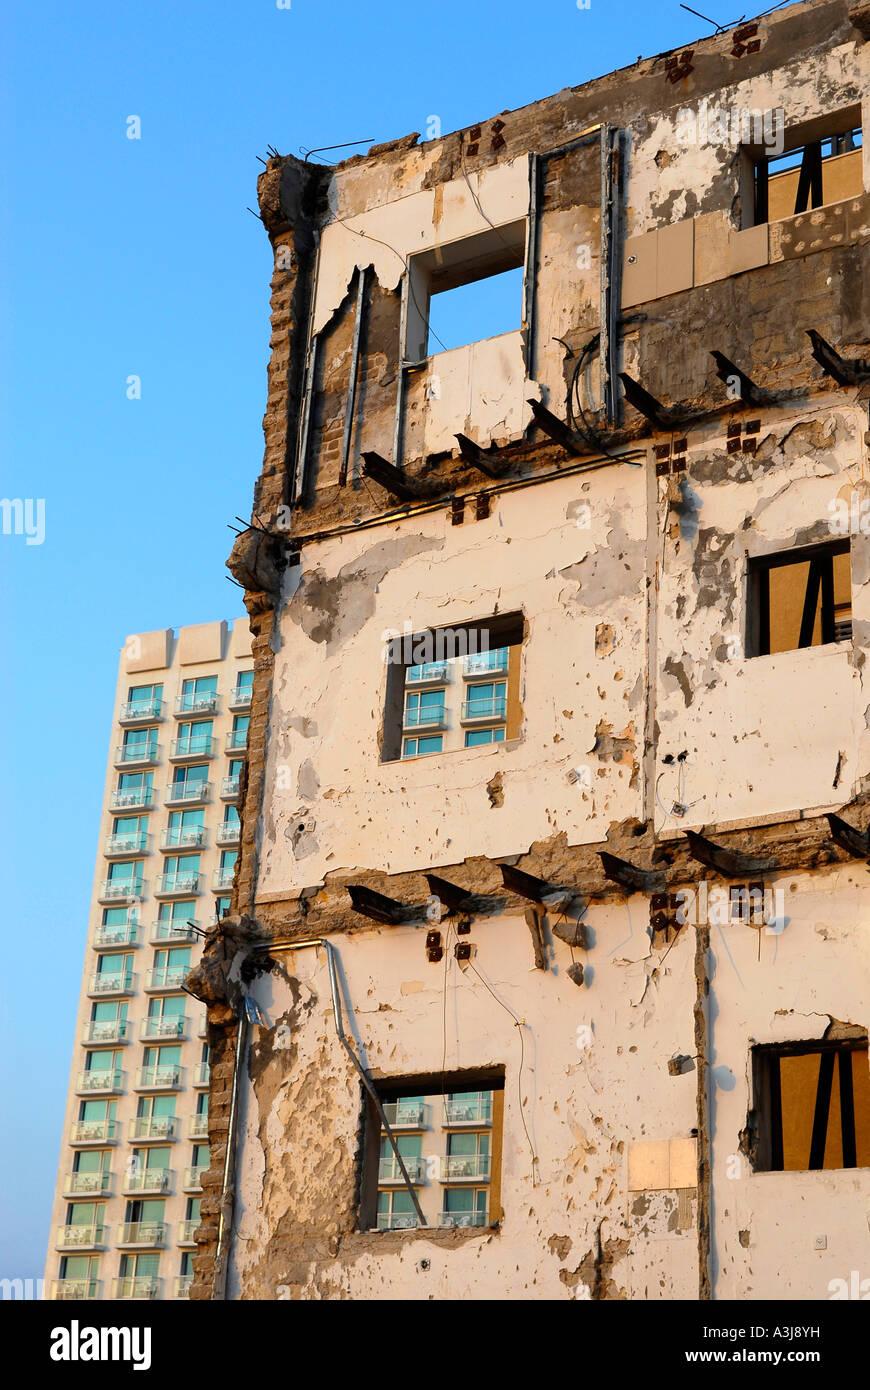 Remnant of demolished building stands in stark contrast to modern hotel in Tel Aviv Israel - Stock Image